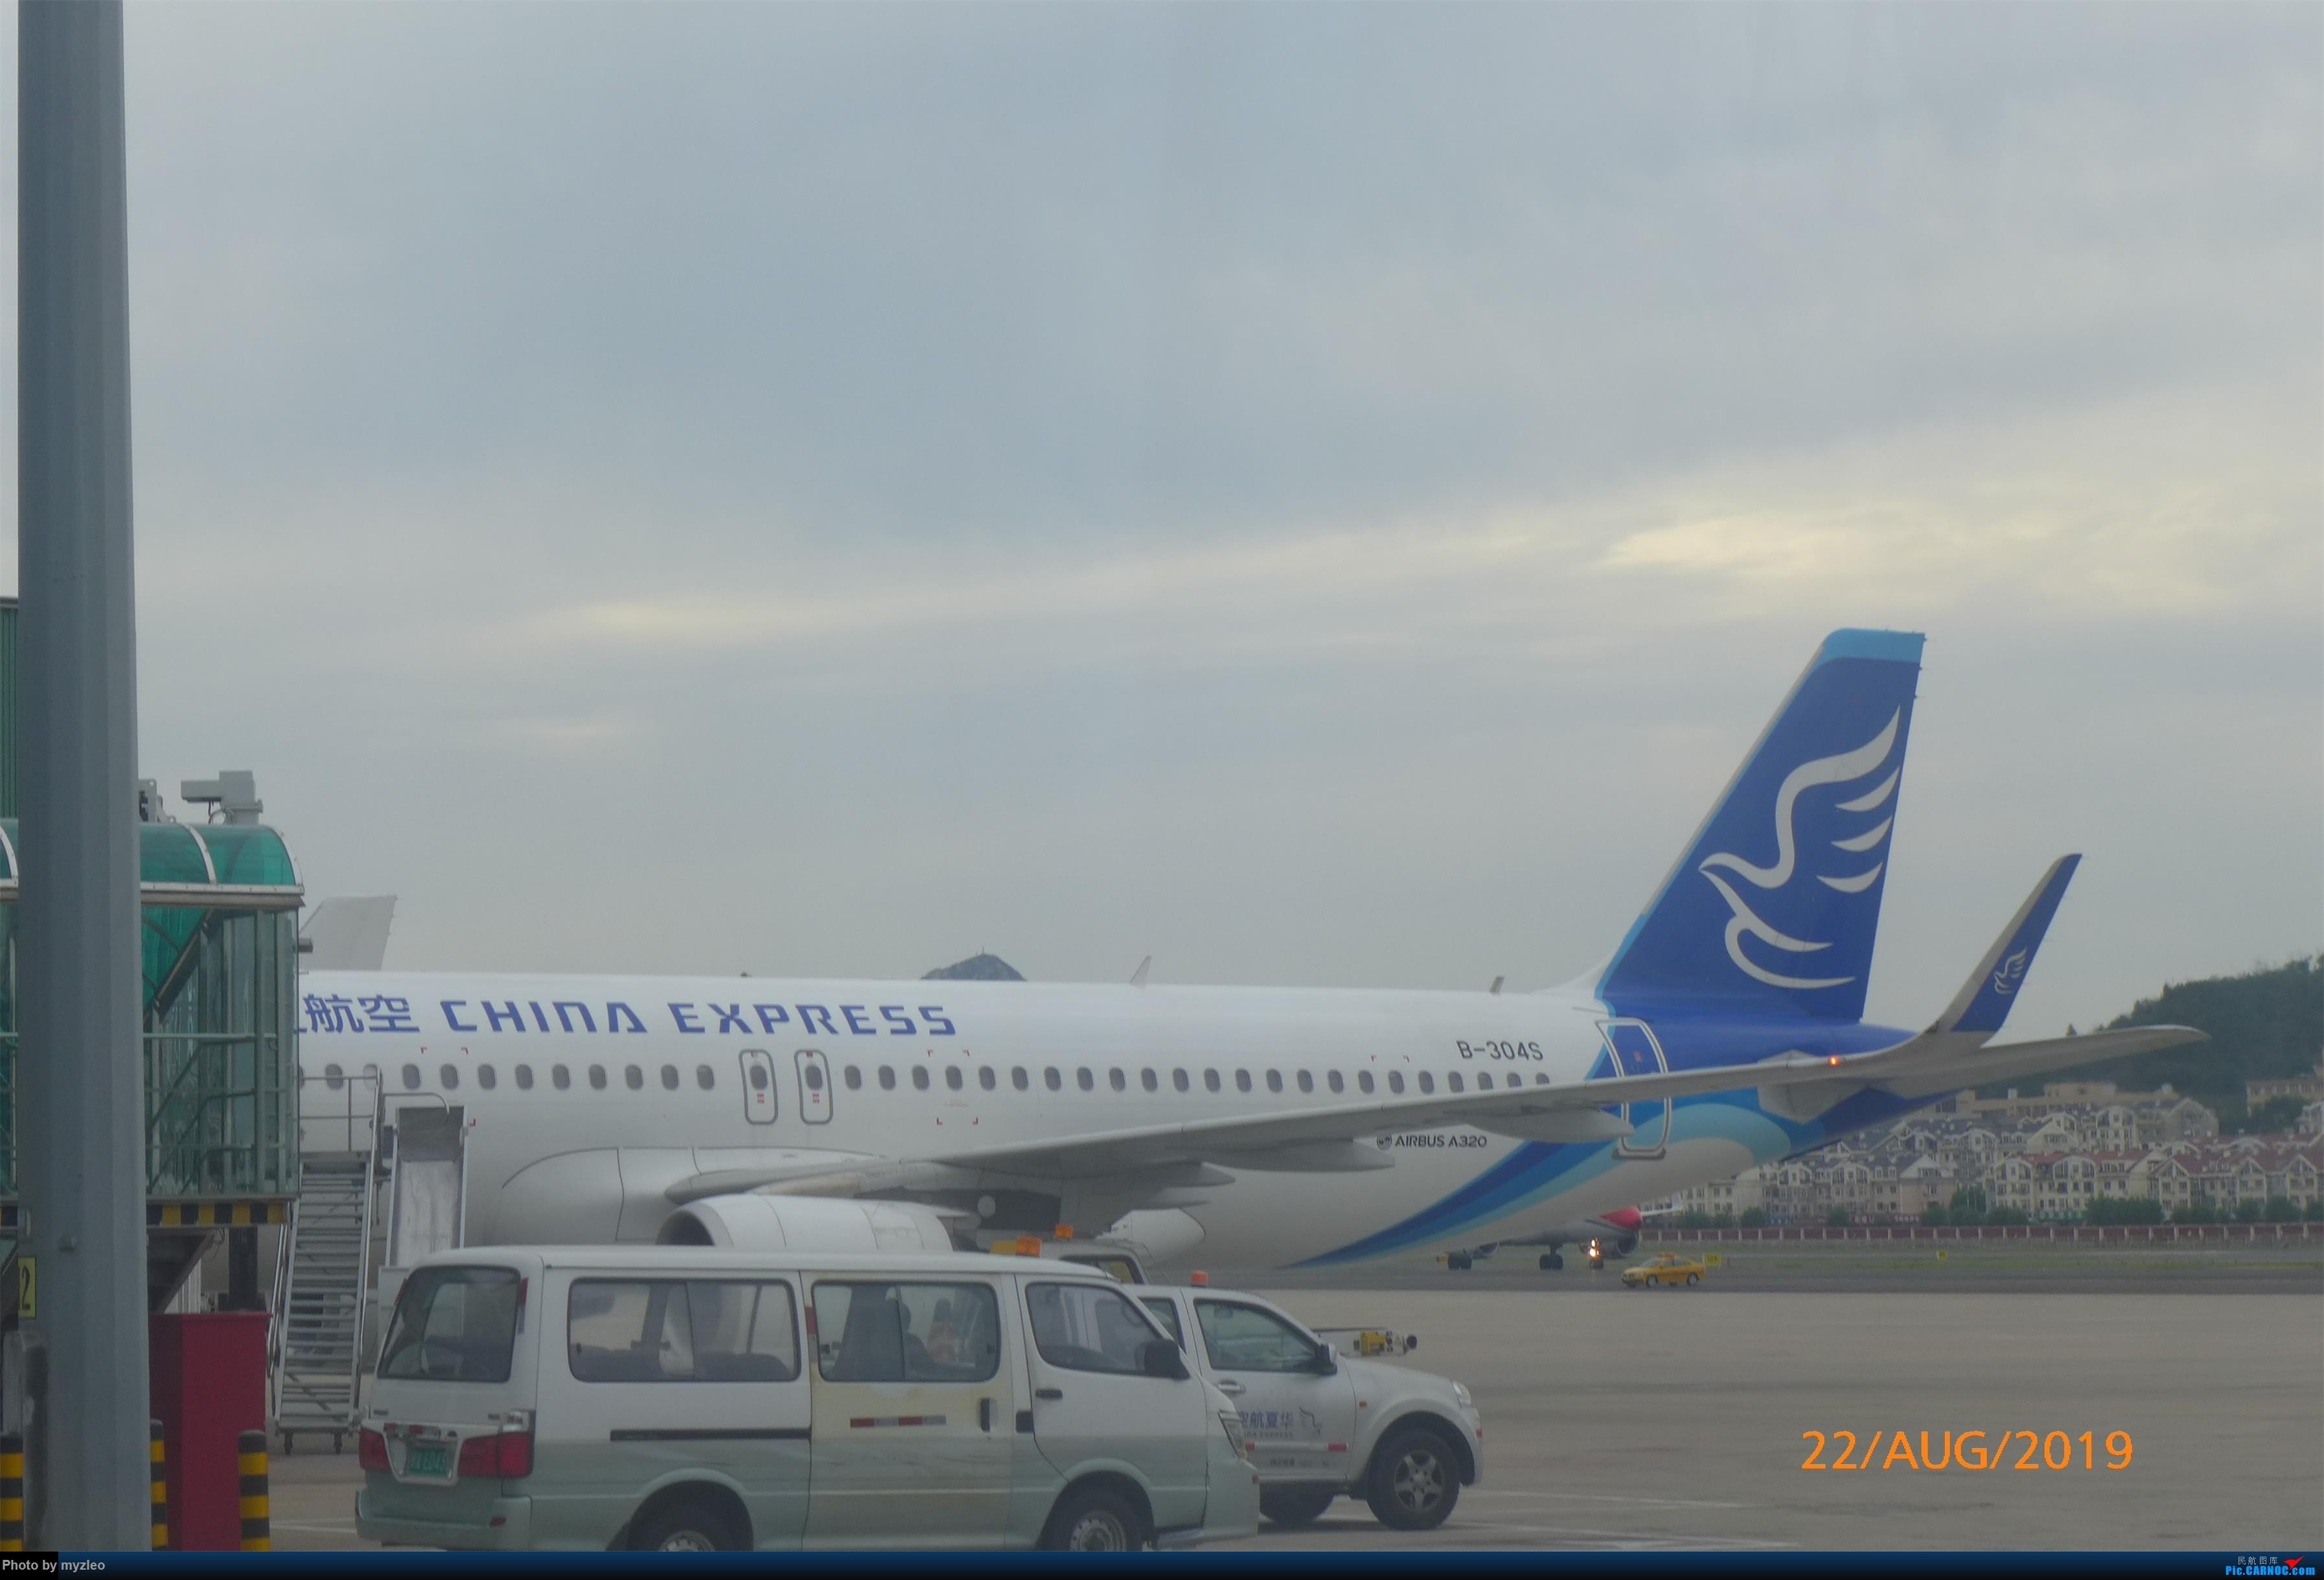 Re:[原创]【myzleo的游记5.2】梦圆一九(2)首访南苑把梦圆,初搭巴航连新缘 AIRBUS A320-200 B-304S 中国大连国际机场